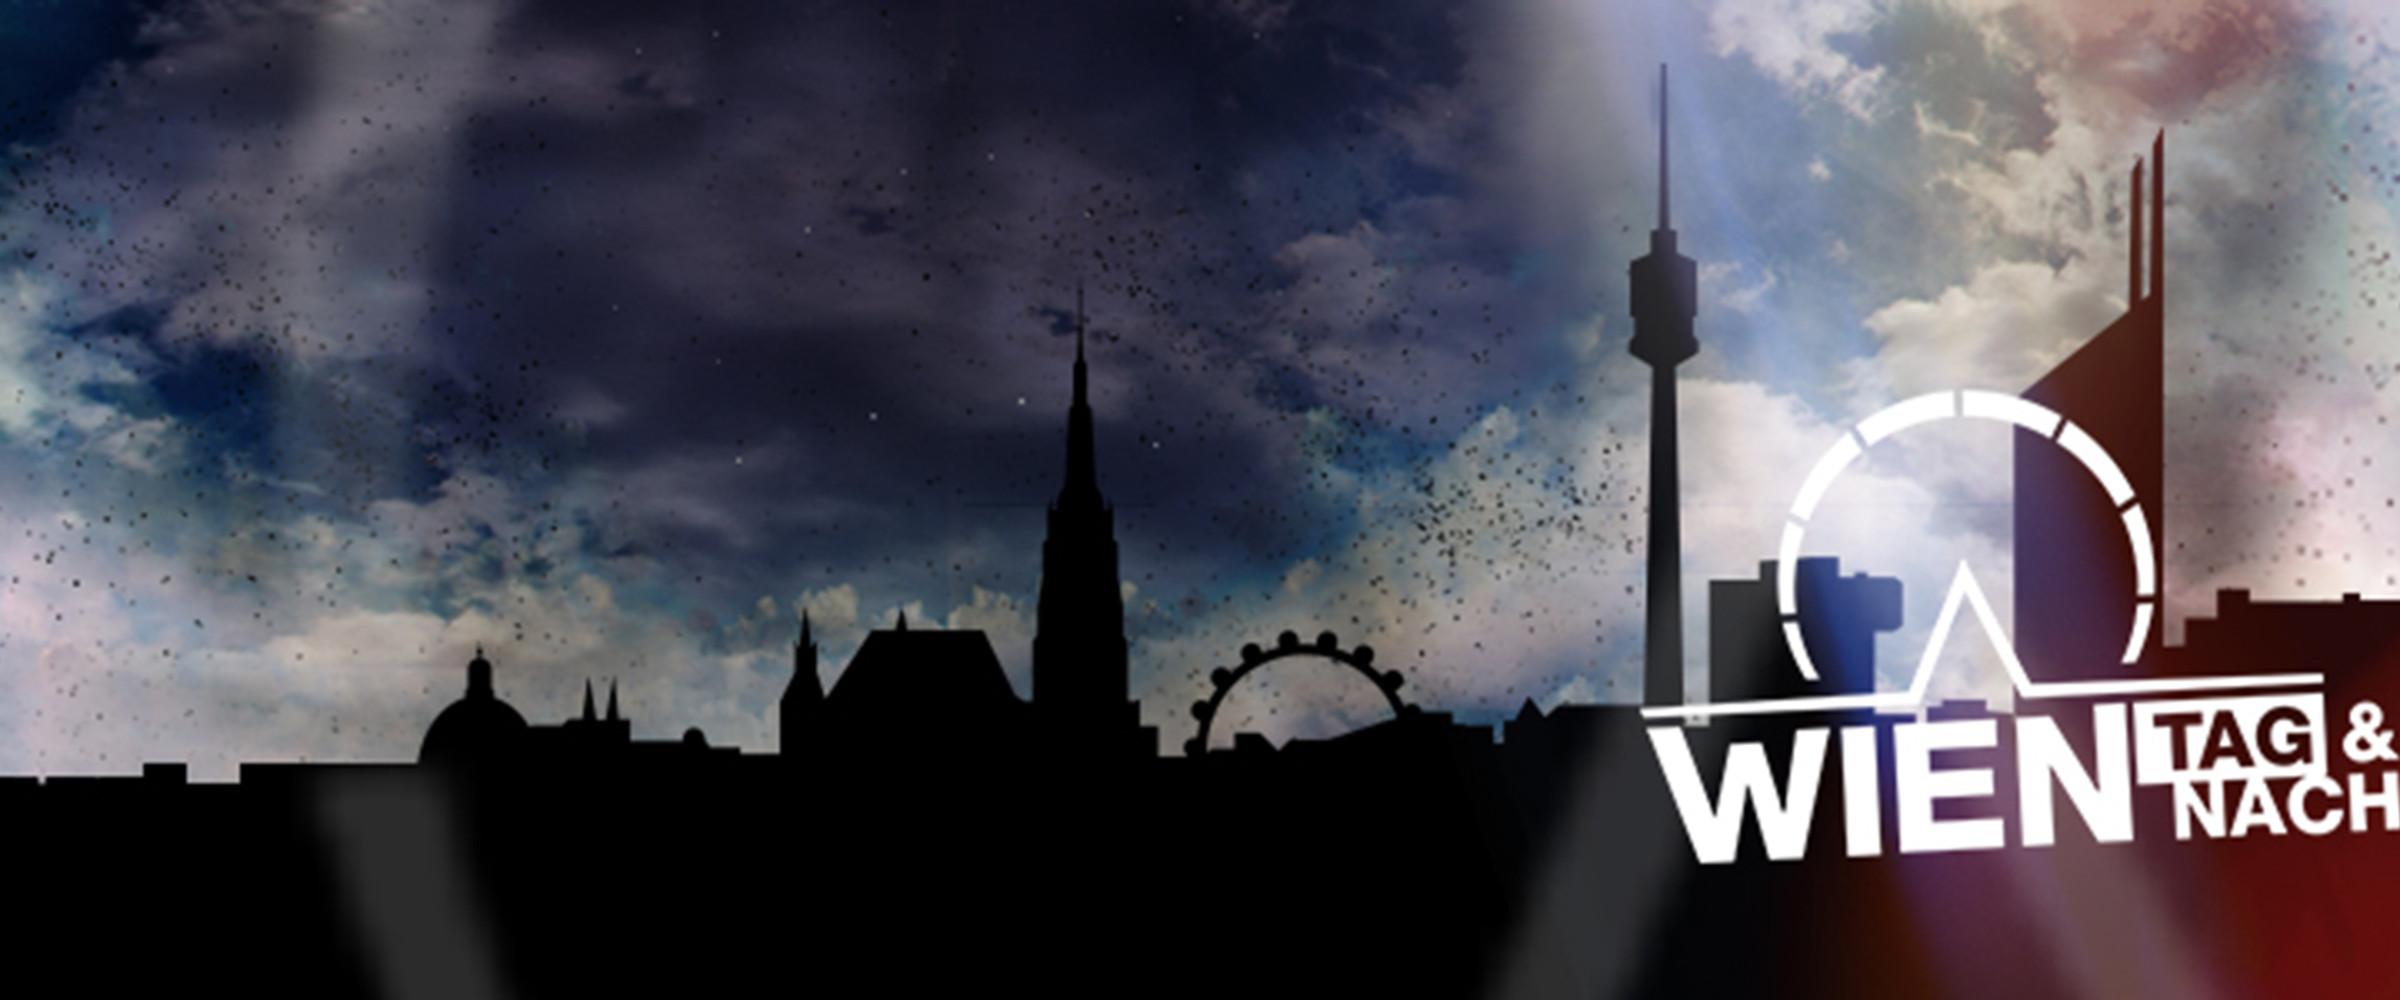 ATV: Wien Tag & Nacht